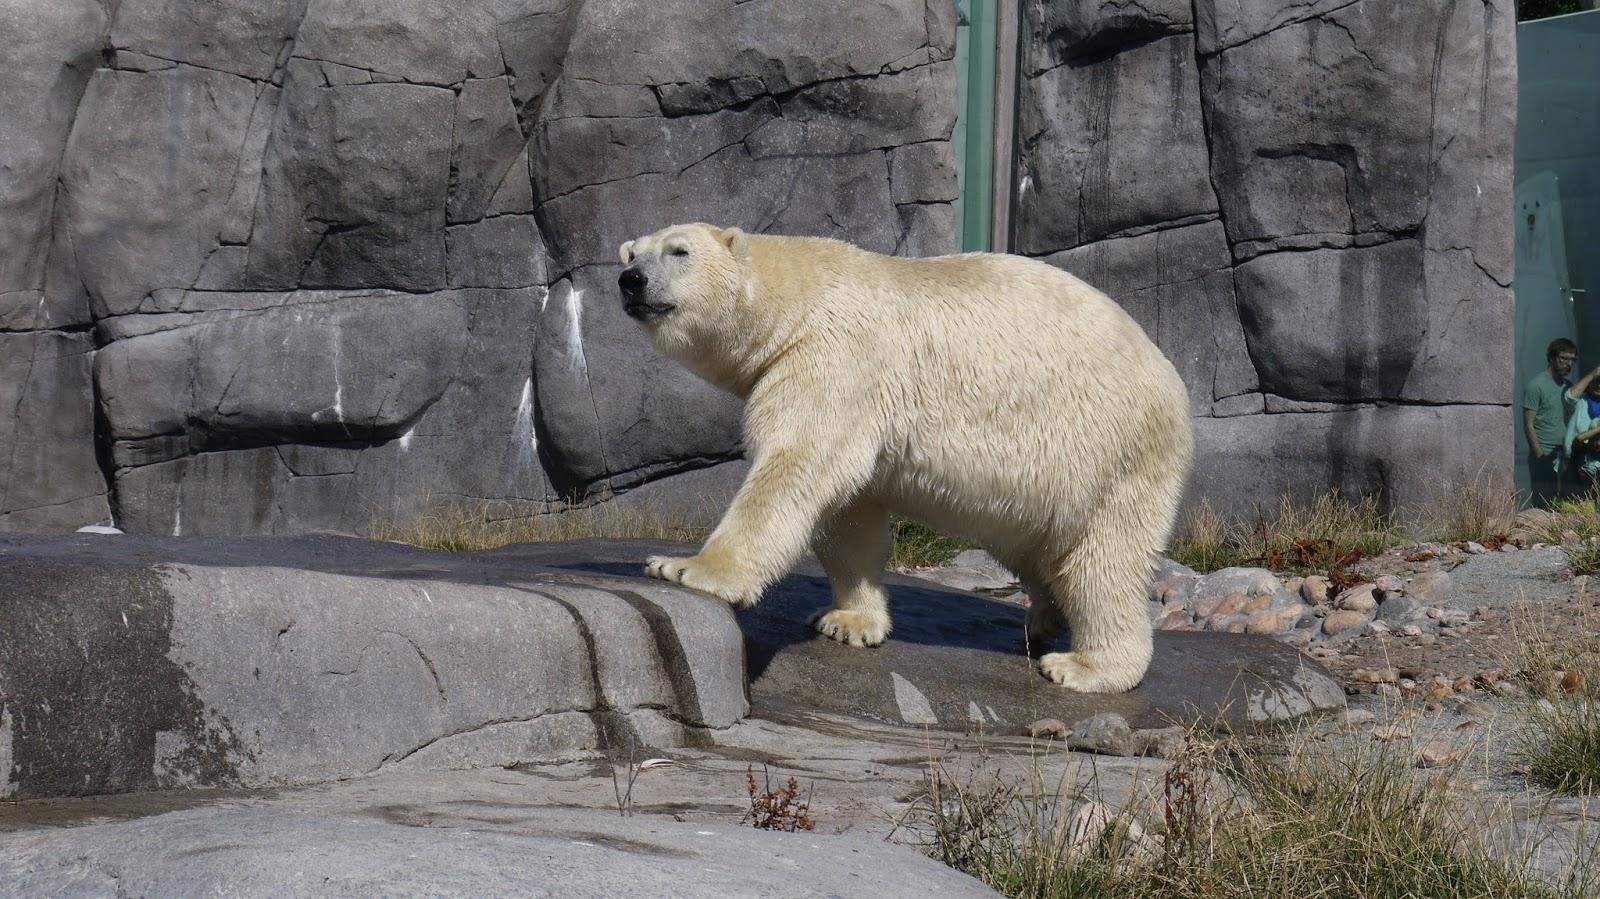 frederiksberg zoo